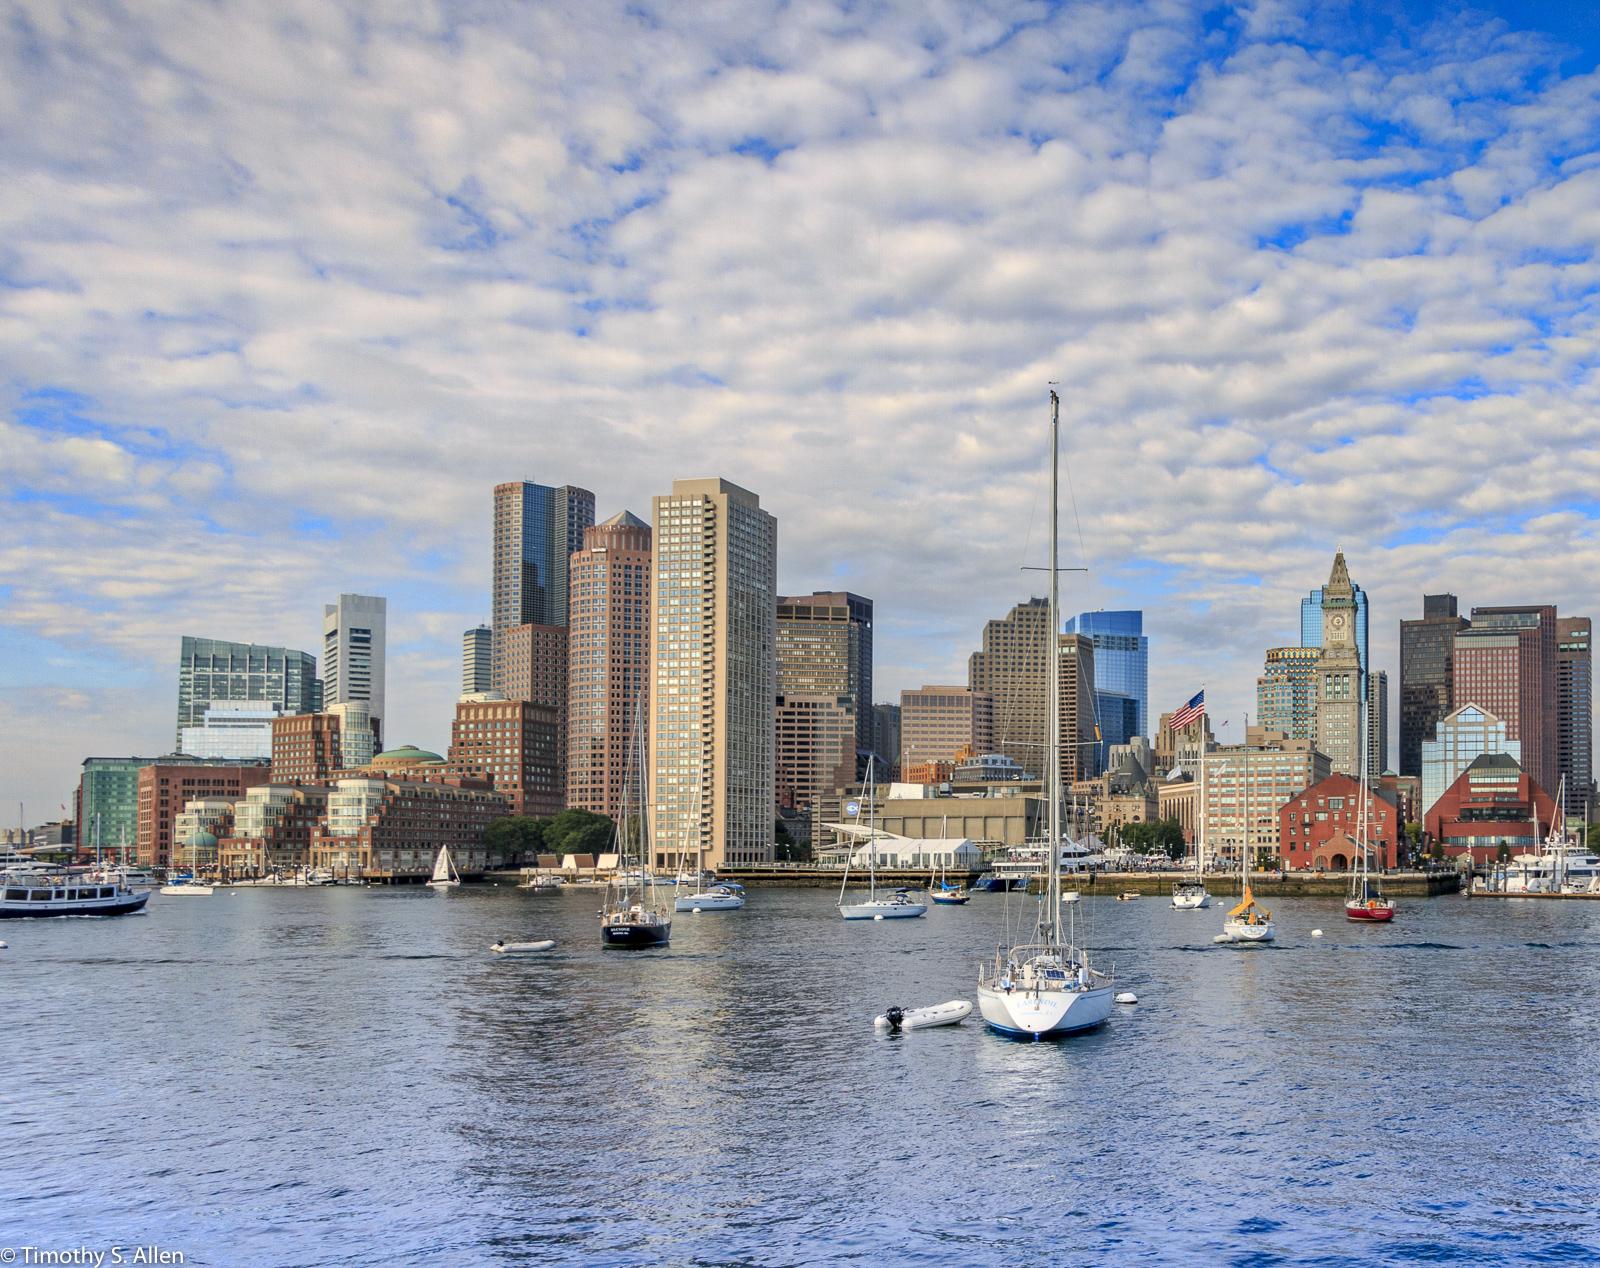 Boston Harbor Boston, MA, USA August 19, 2016